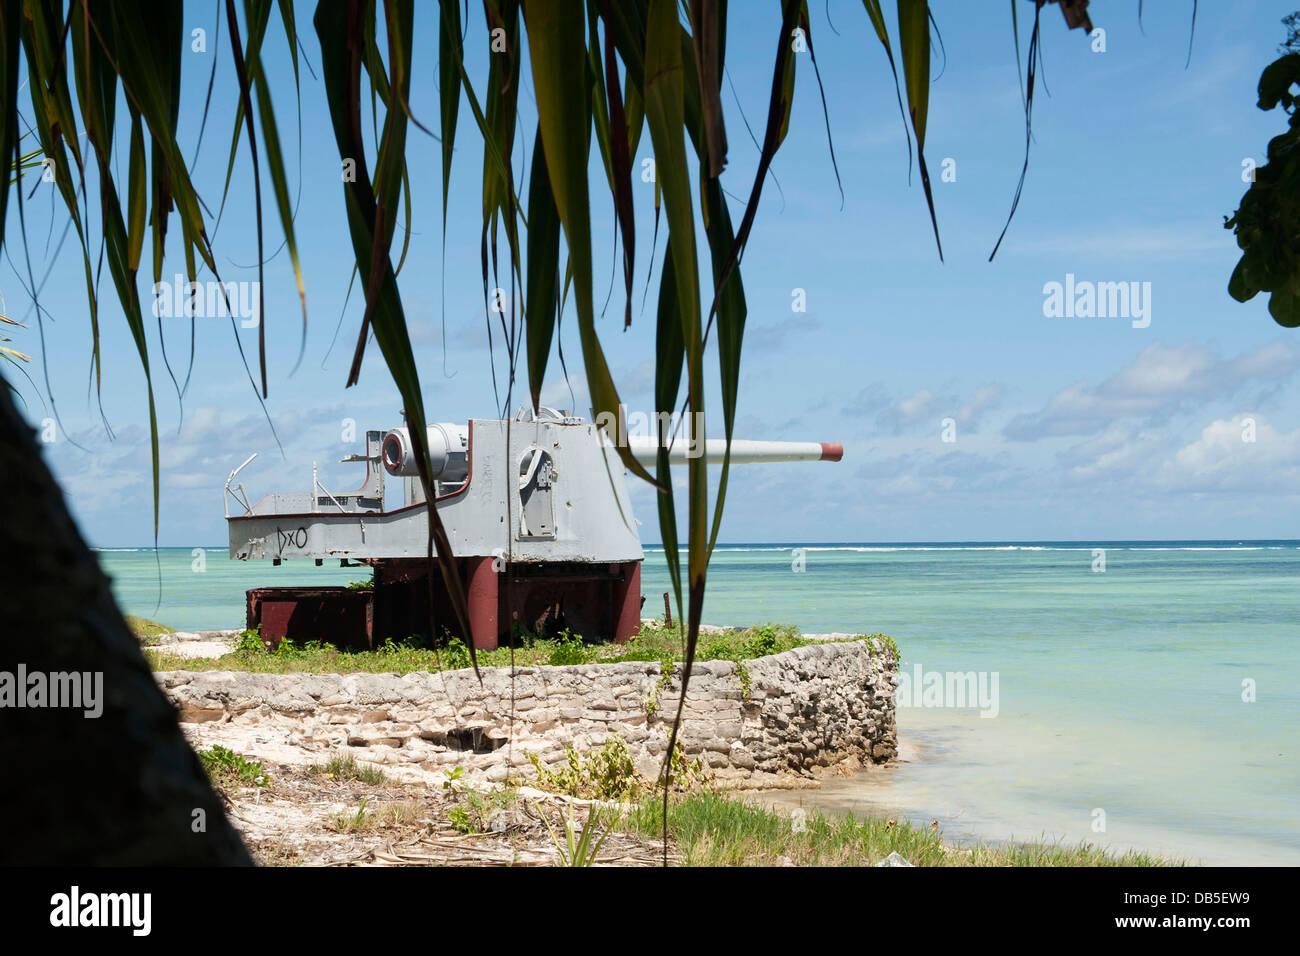 An abandoned World War II coastal defense gun on Red Beach Three July 19, 2013 on the South Pacific island of Tarawa. - Stock Image